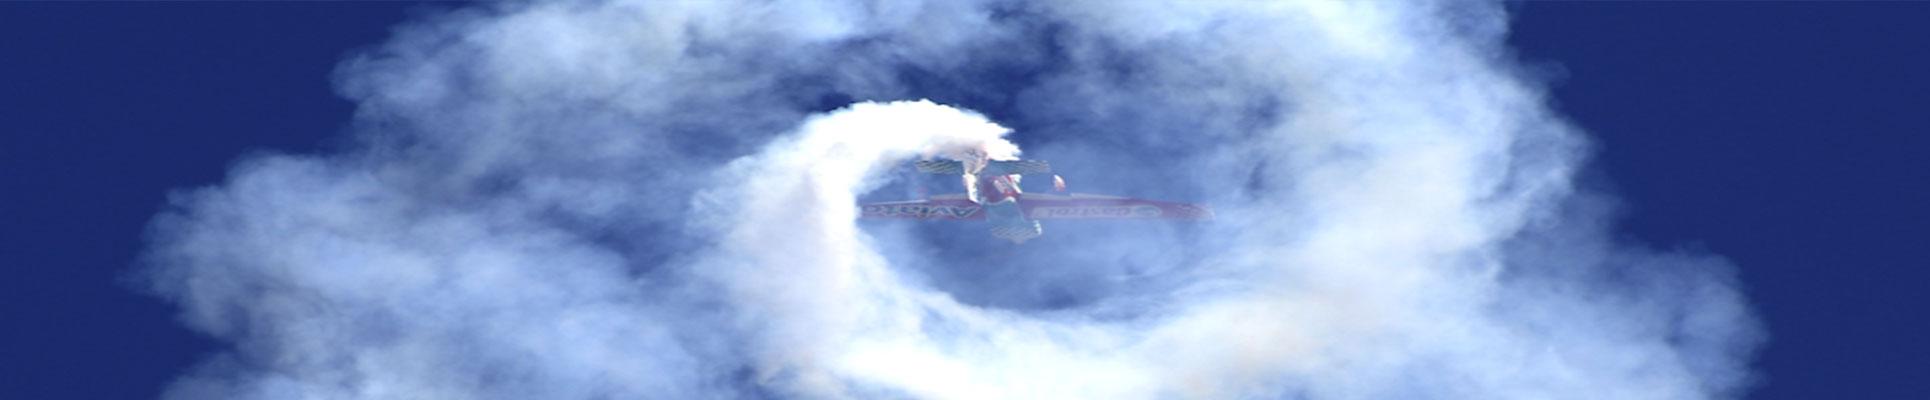 Barossa-Airshow-Barossa-Valley-12